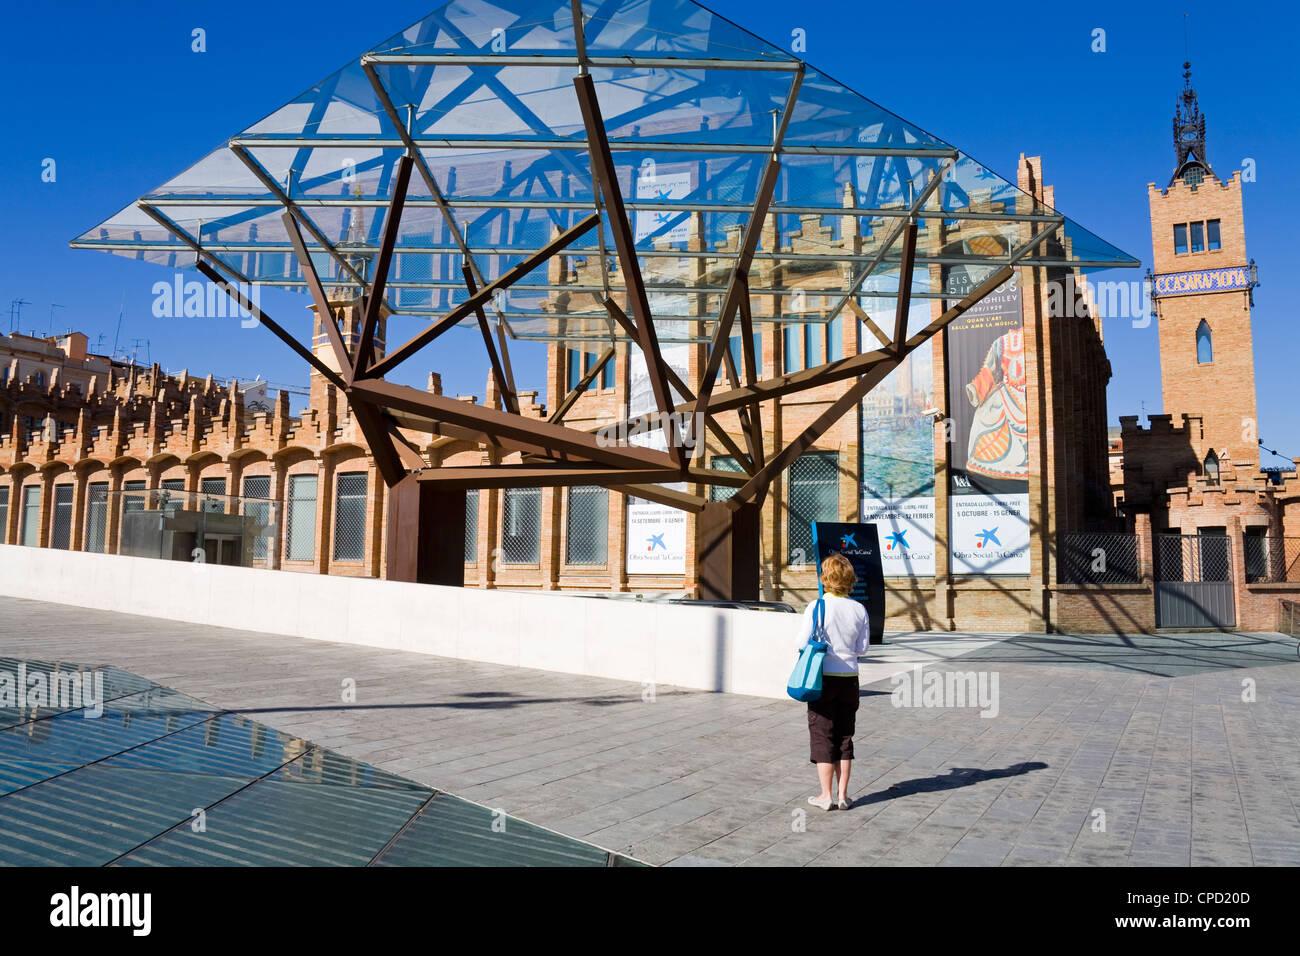 CaixaForum in the Montjuic District, Barcelona, Catalonia, Spain, Europe - Stock Image